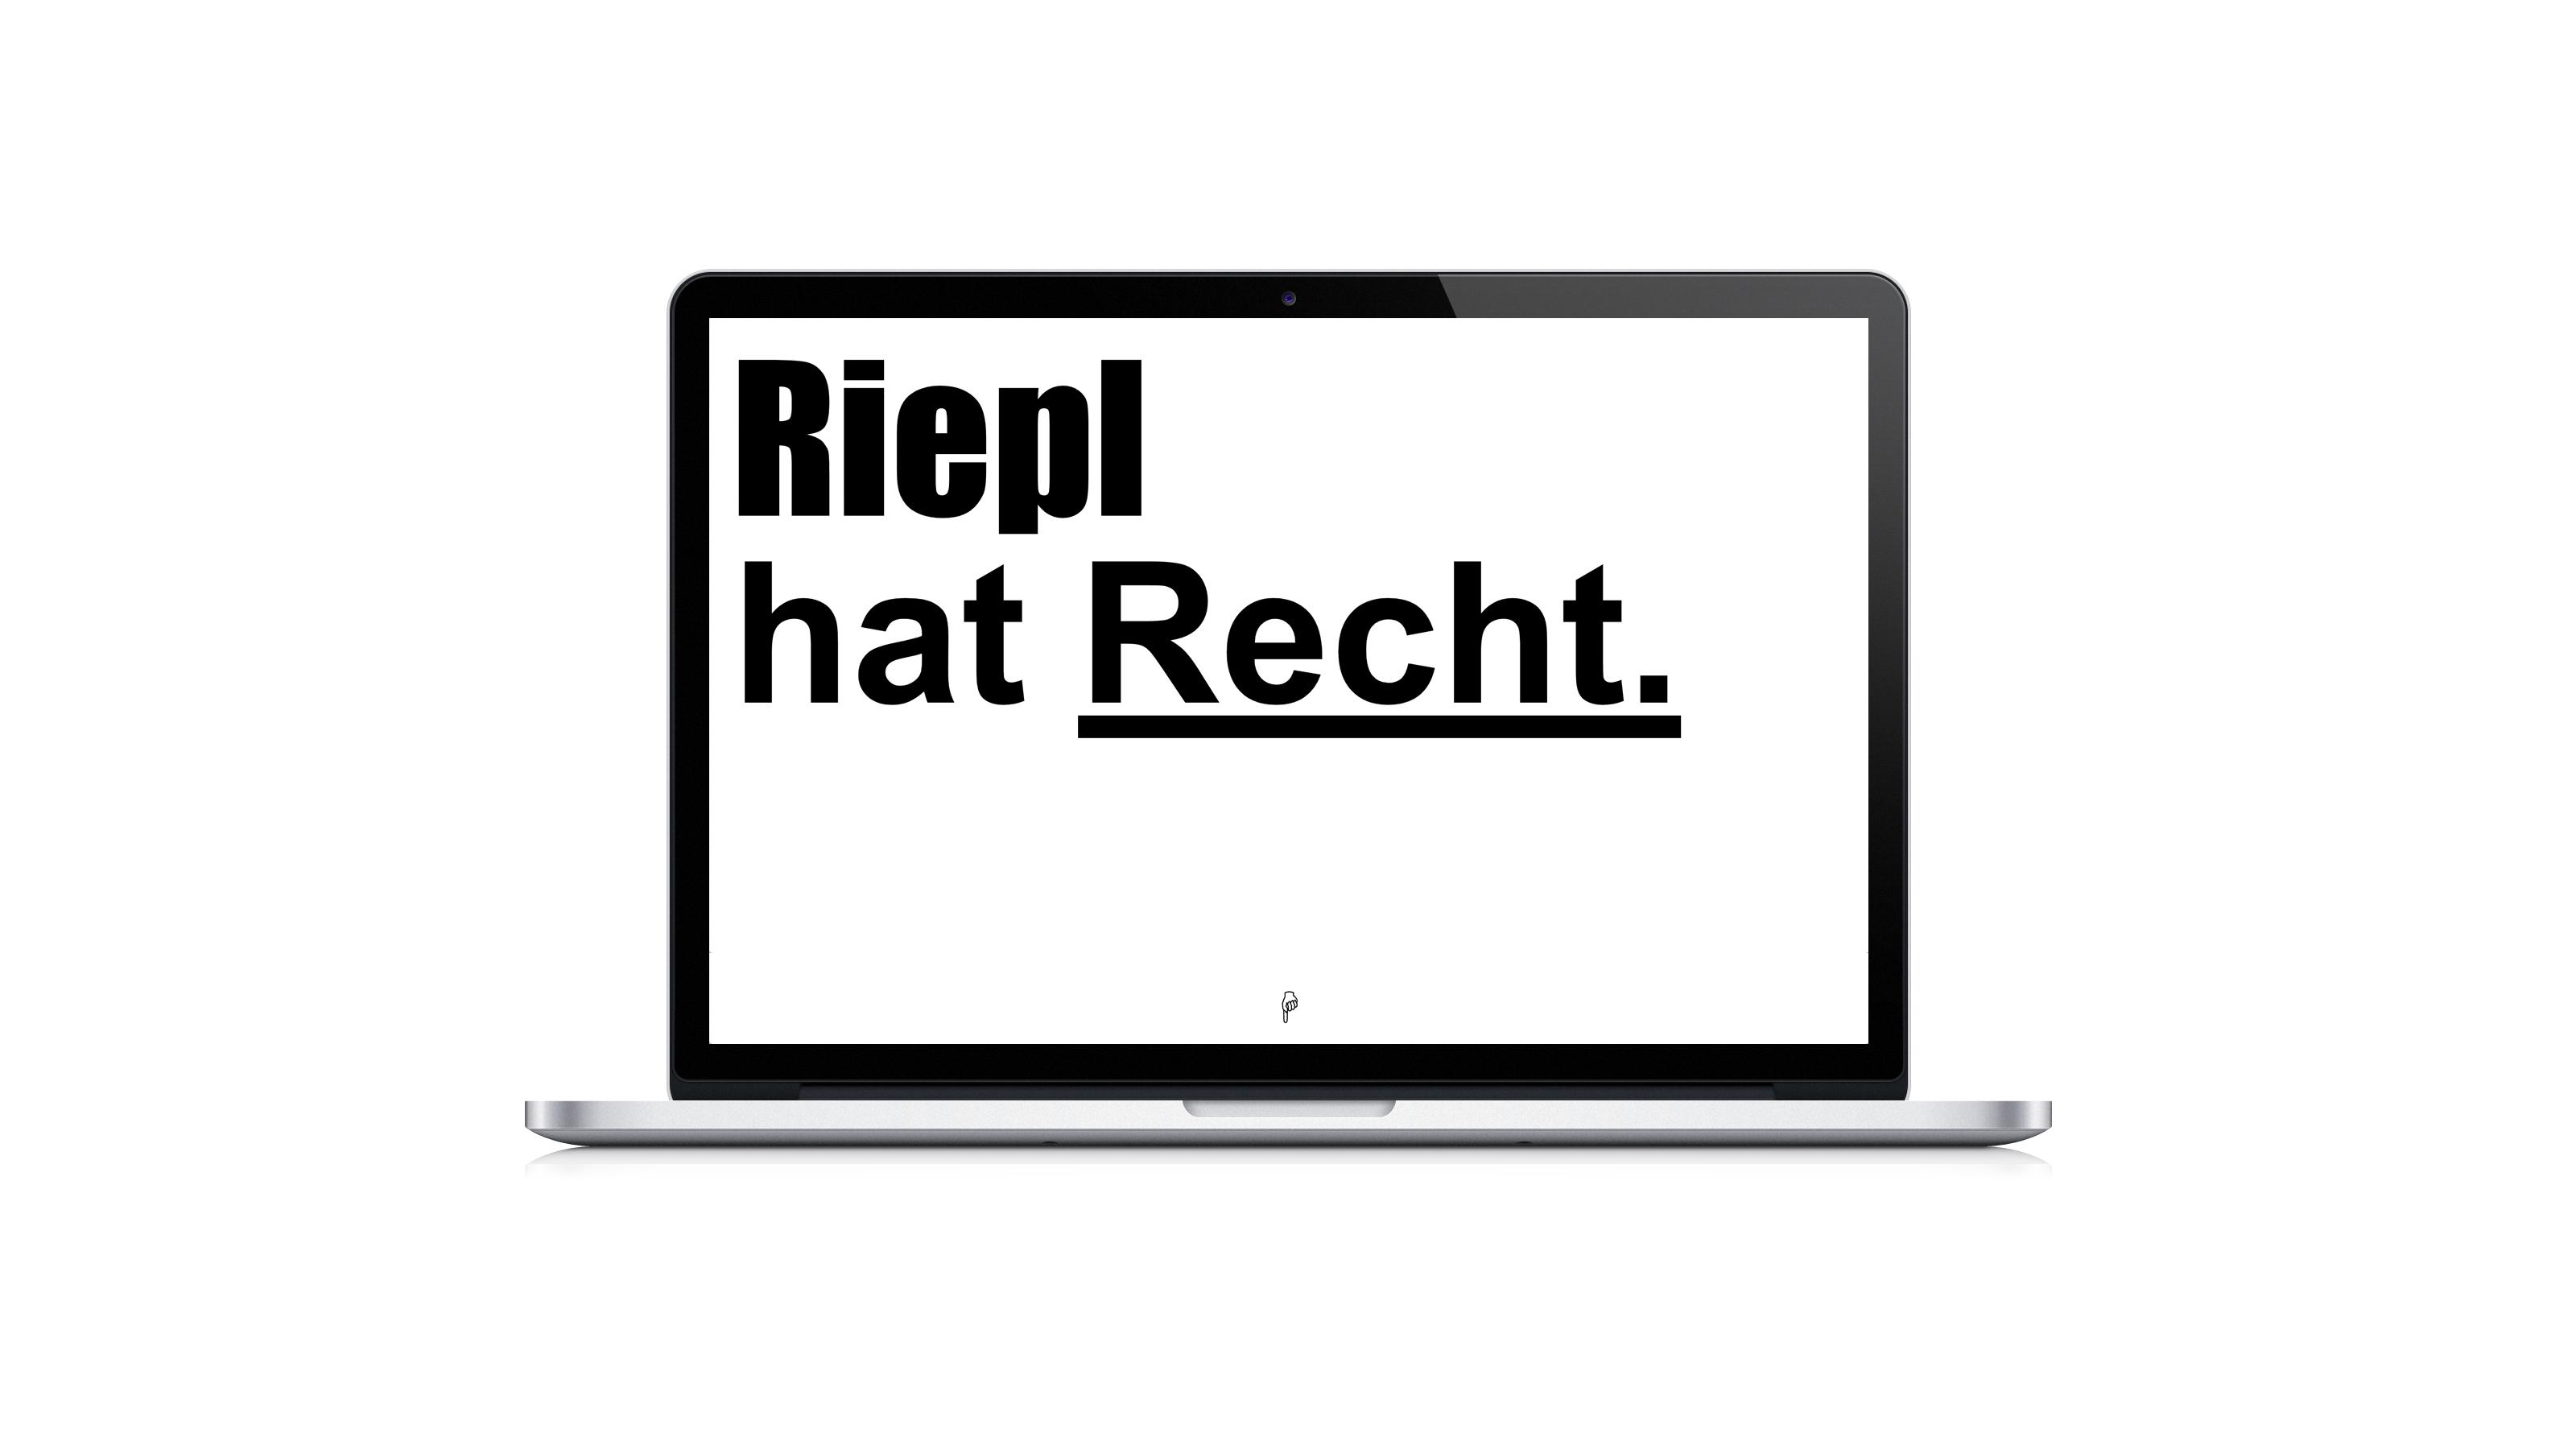 Riepl Referenz Laptop